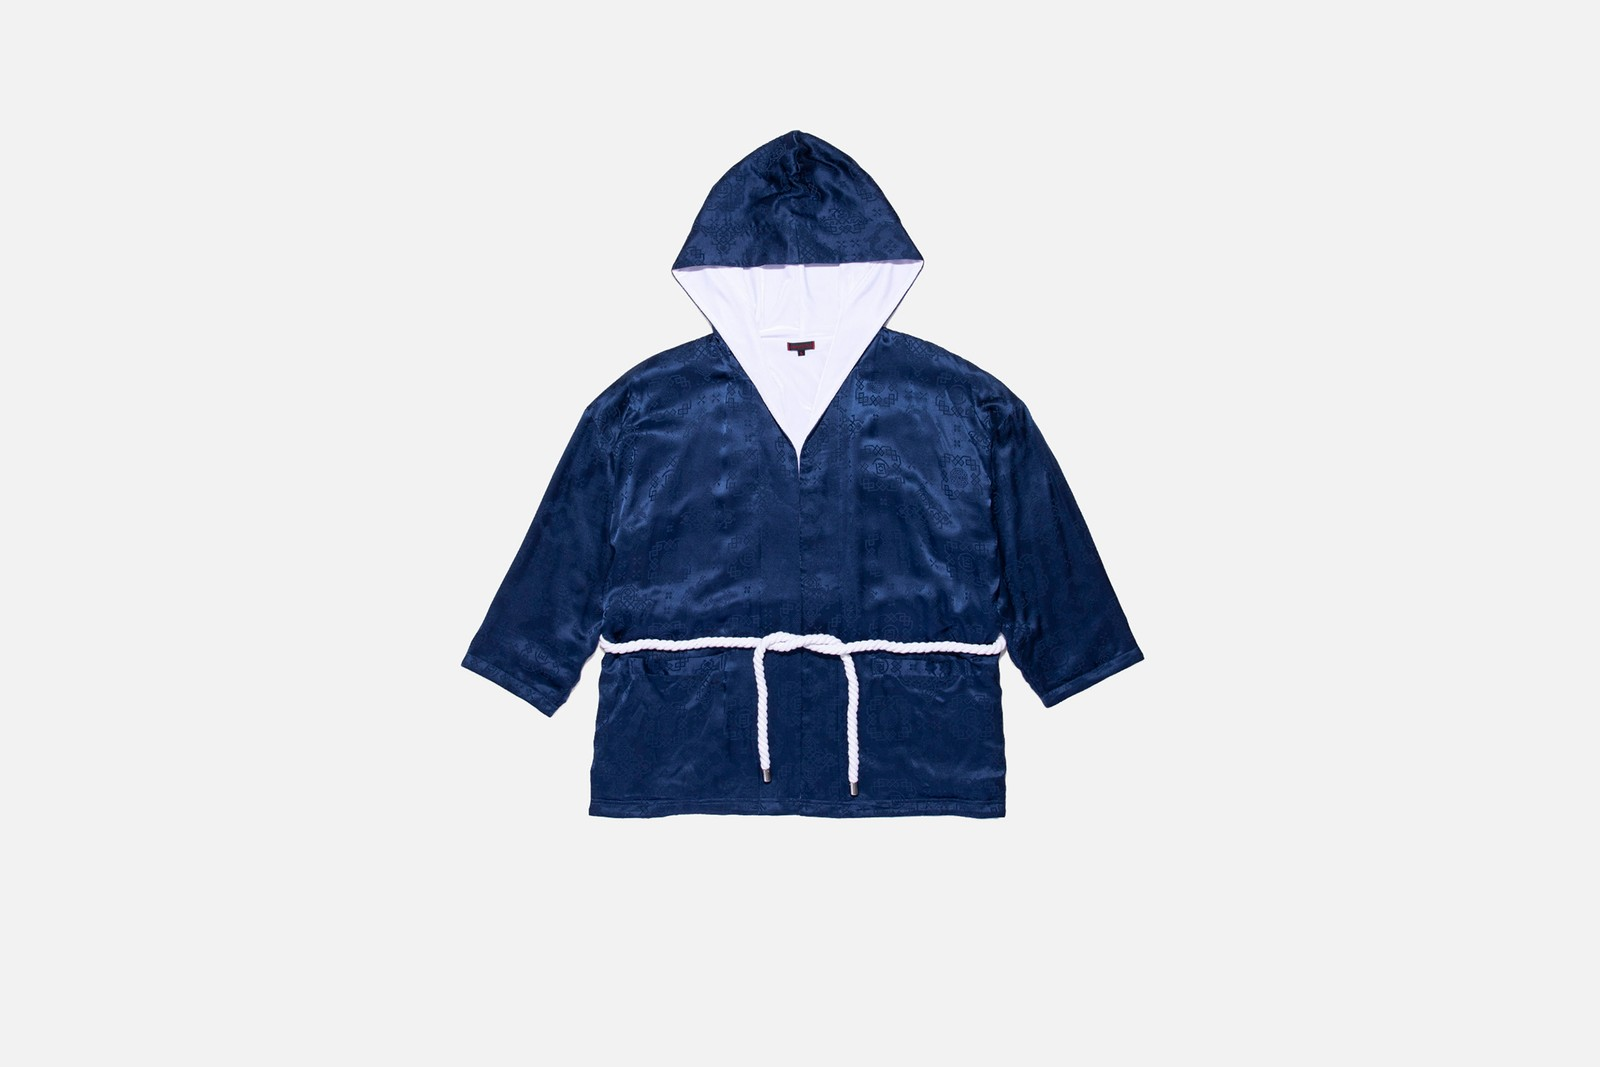 CLOT x NIKE「ROYALE UNIVERSITY BLUE SILK」宣傳片正式釋出